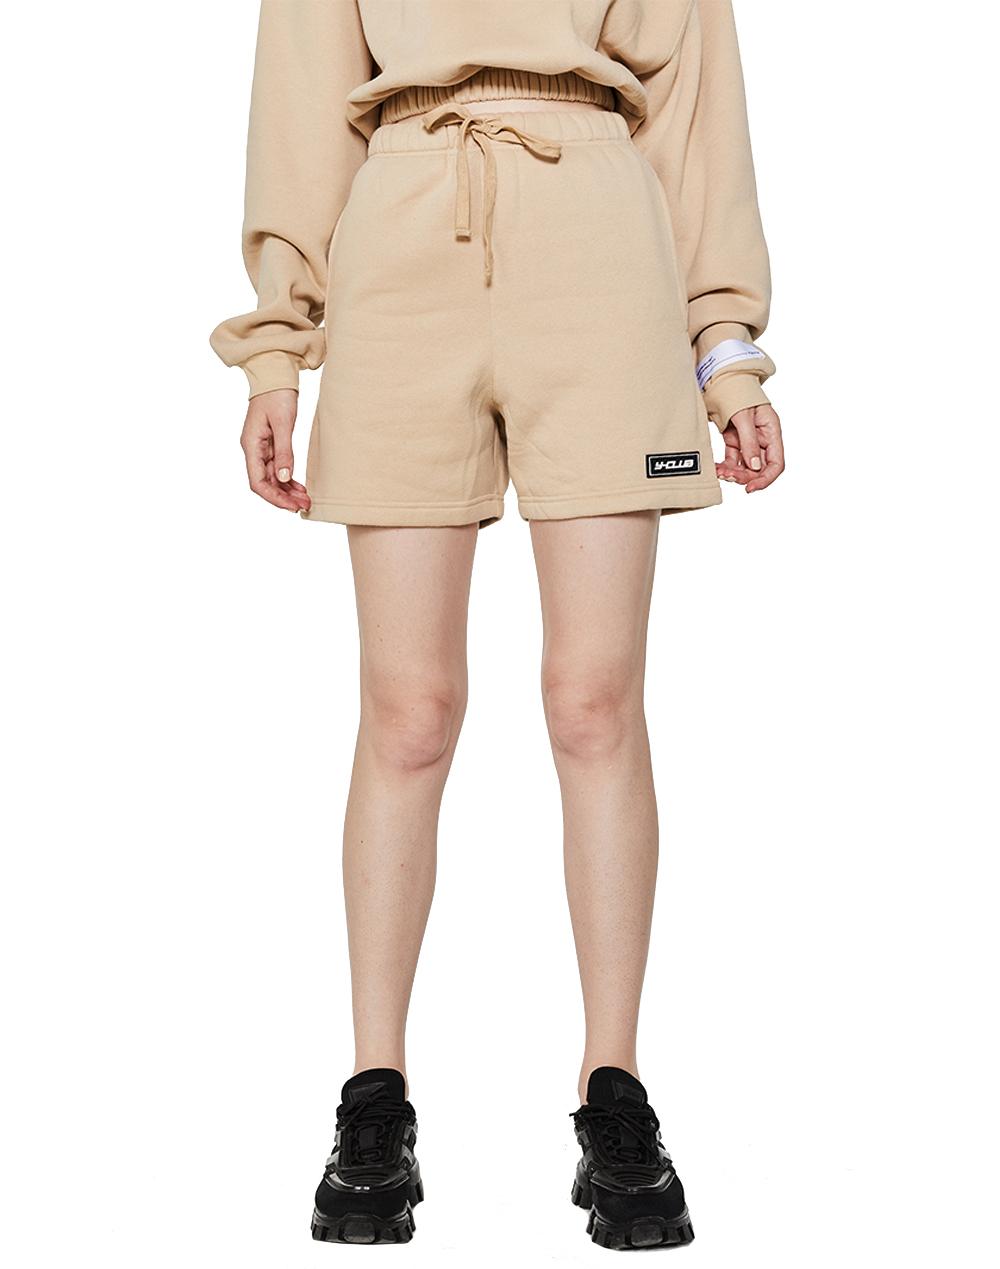 Effortless Chic Shorts-YUYU